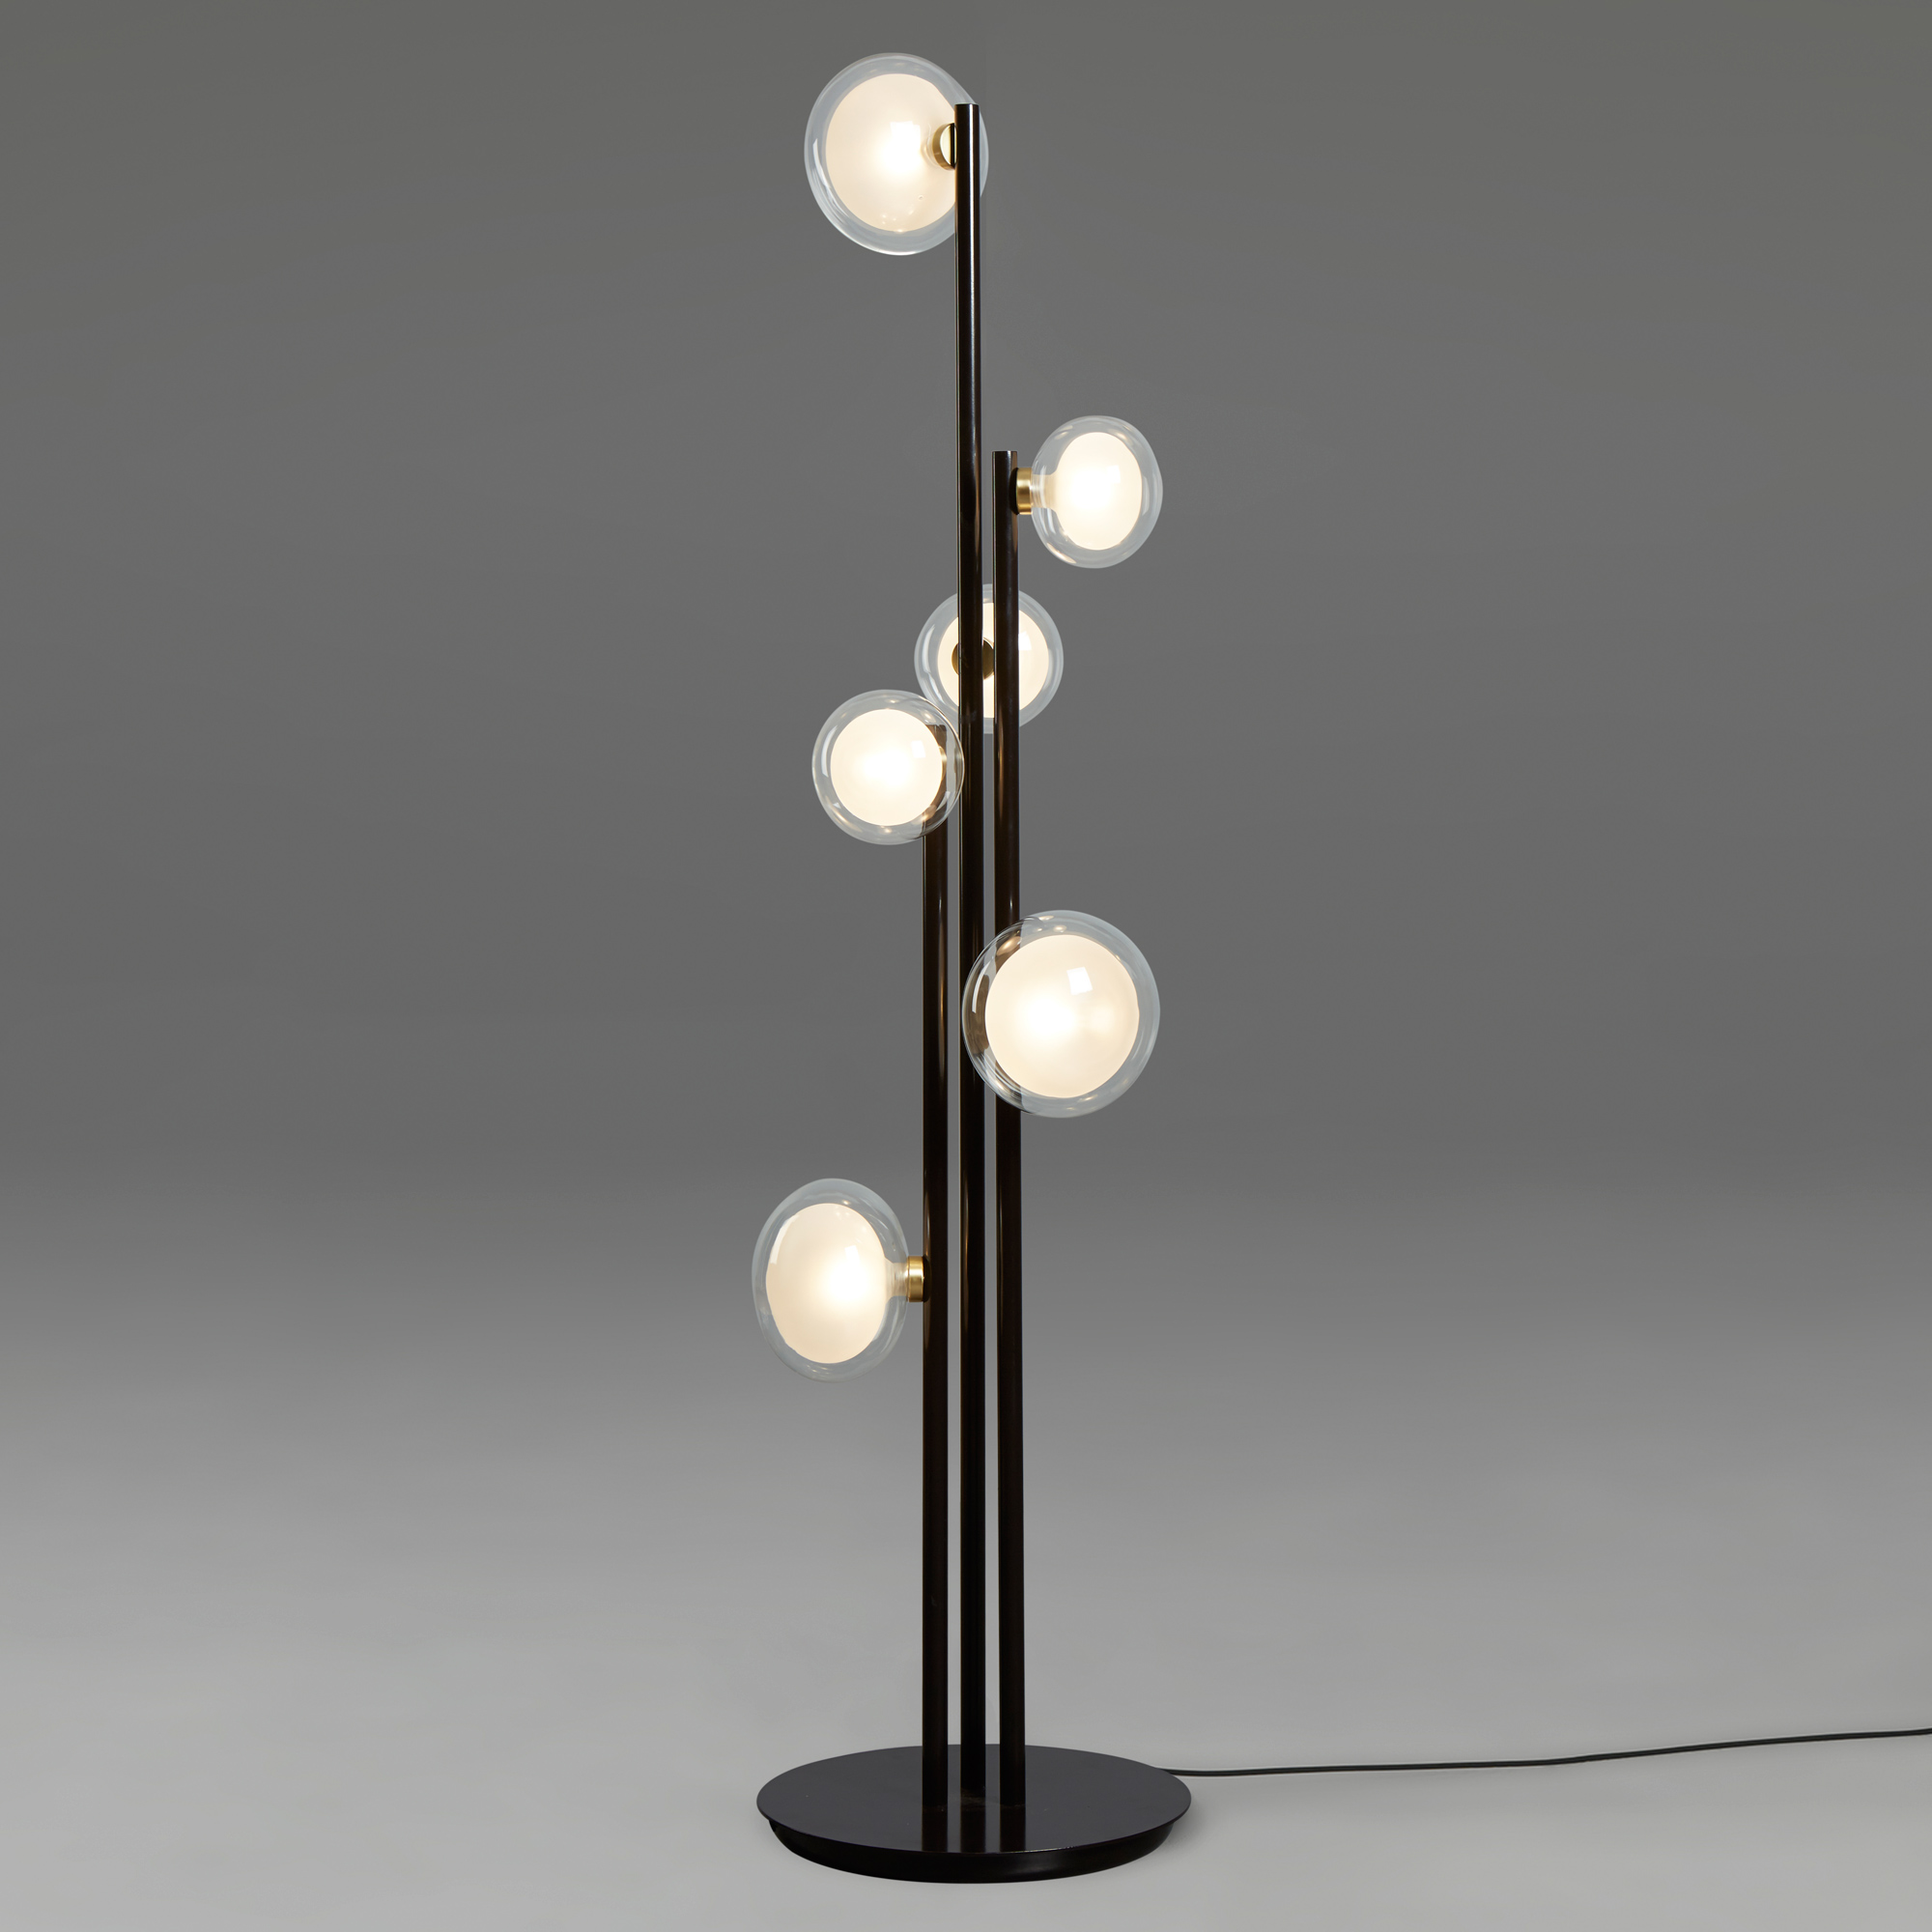 La Floor Lamp By Tooy 68 552 66 Bk Br